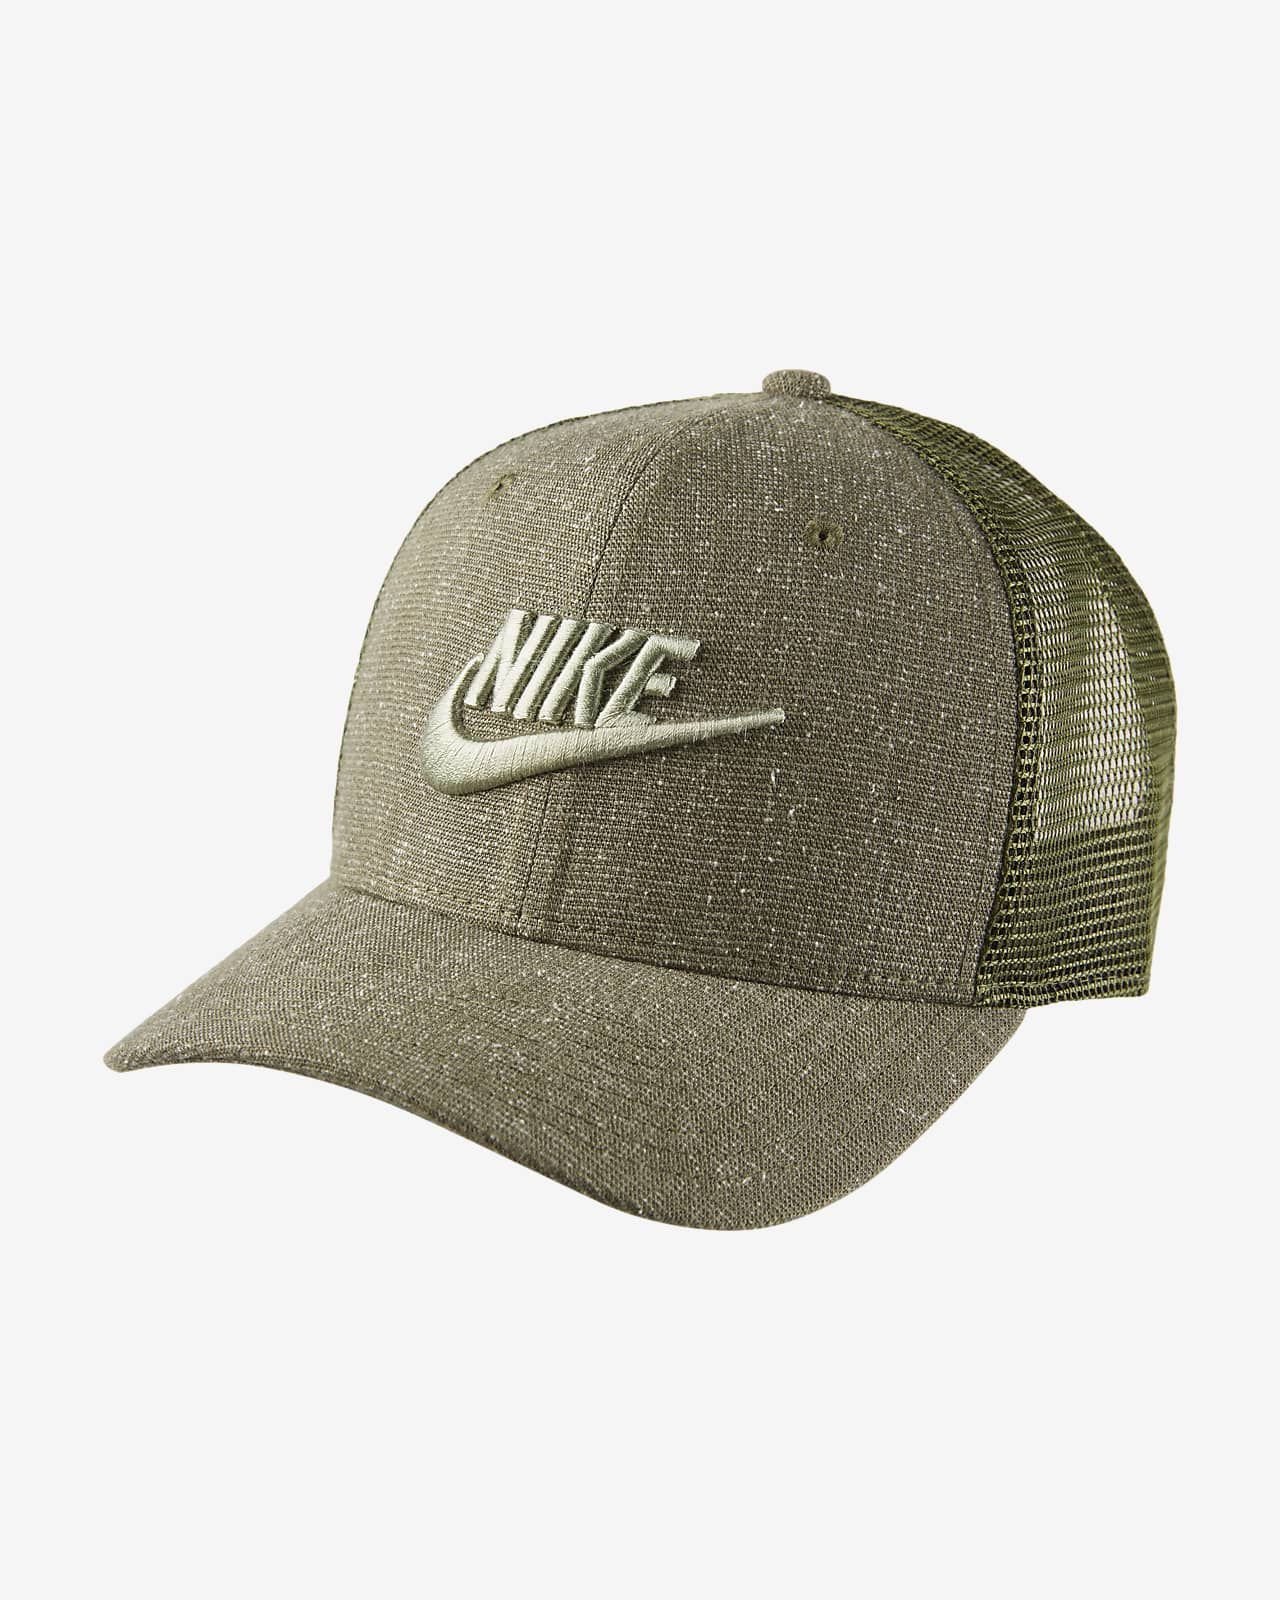 Nike Sportswear Classic 99 嘻哈帽。Nike TW